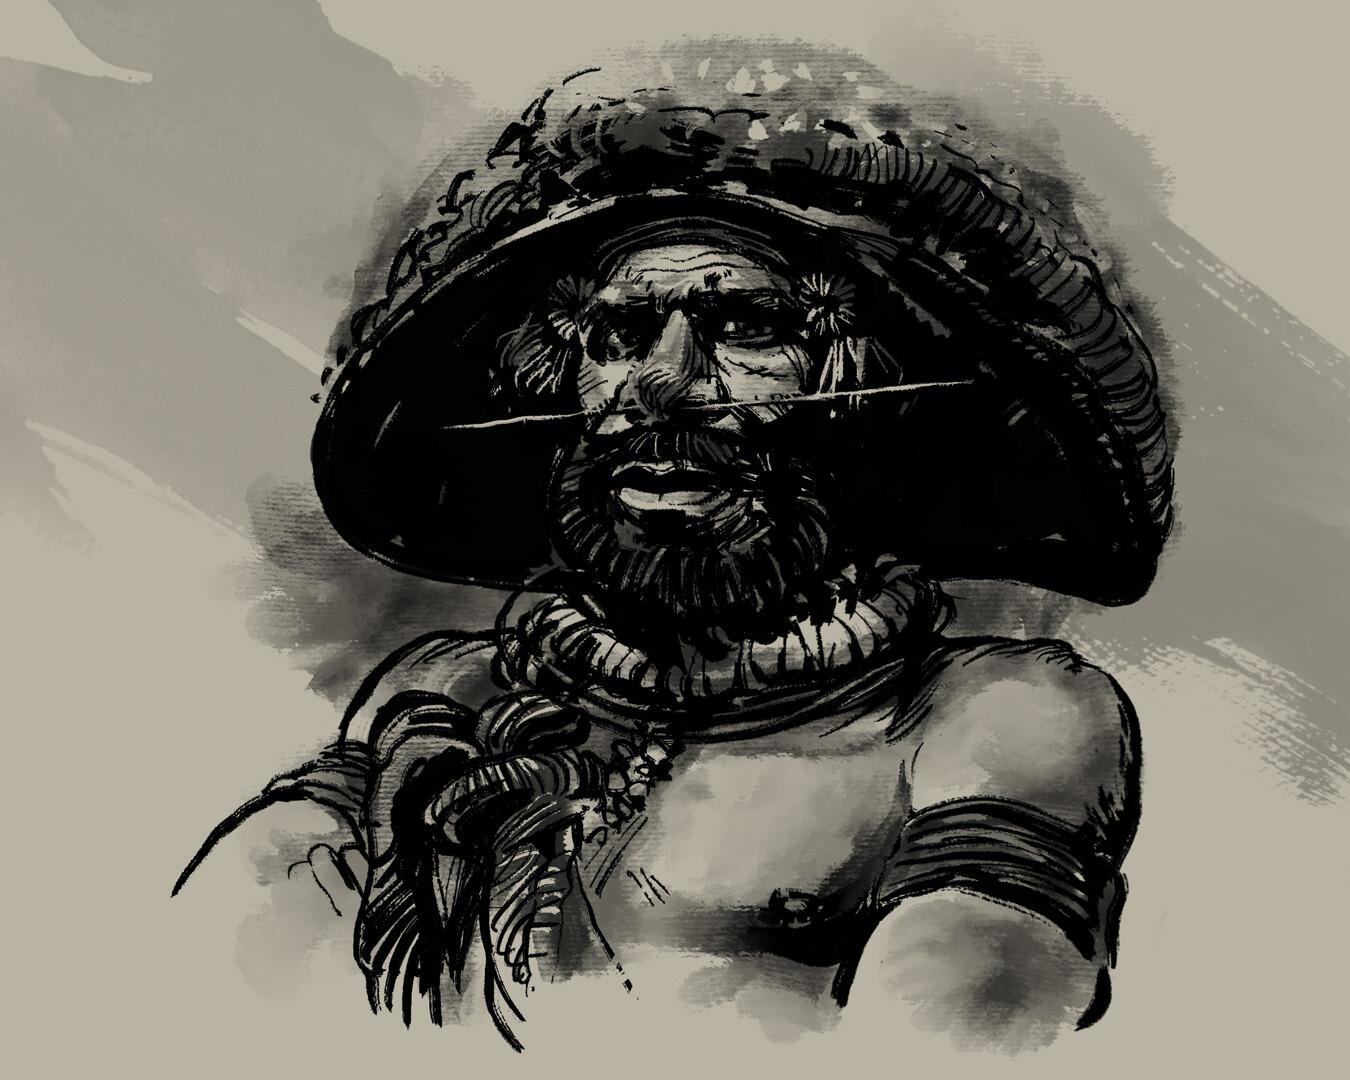 Huli wigman - Papua tribesman